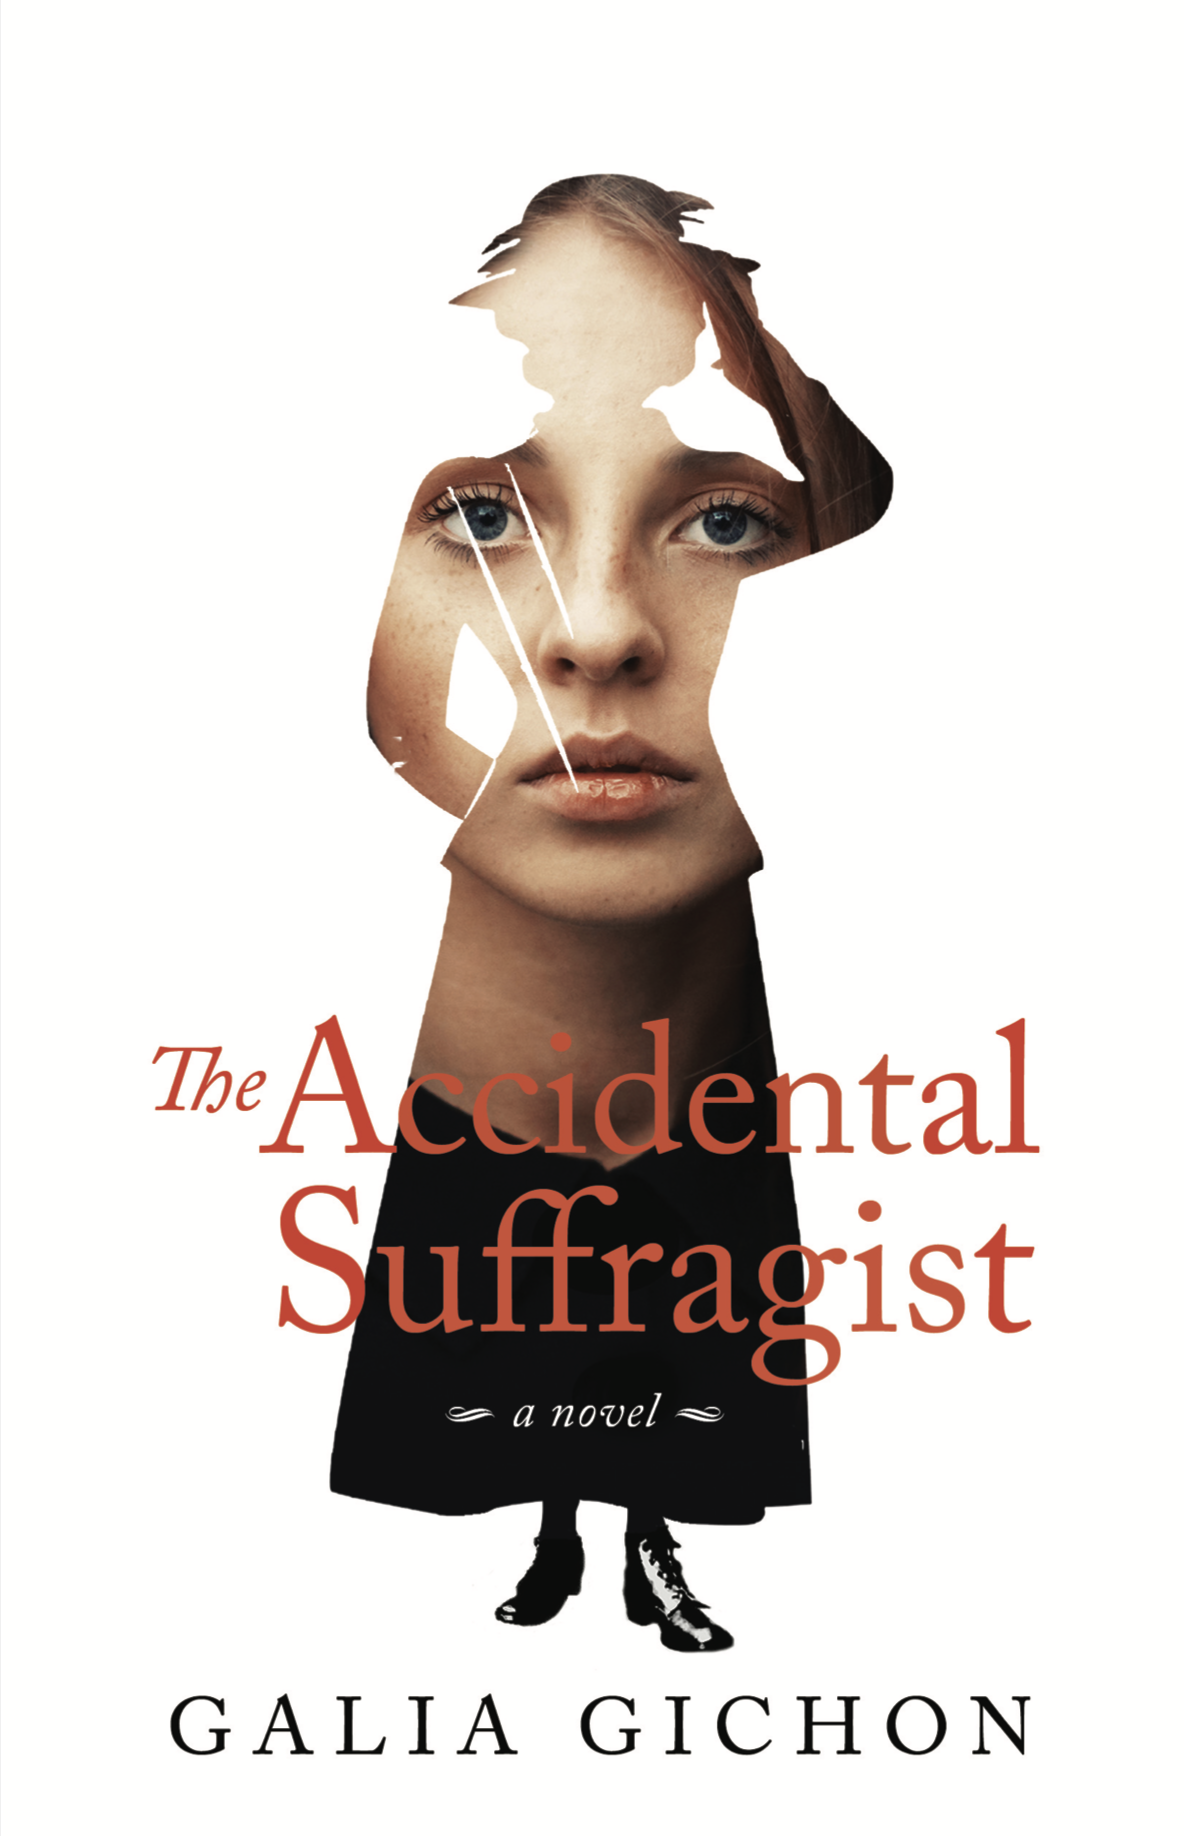 The Accidental Suffragist by Galia Gichon